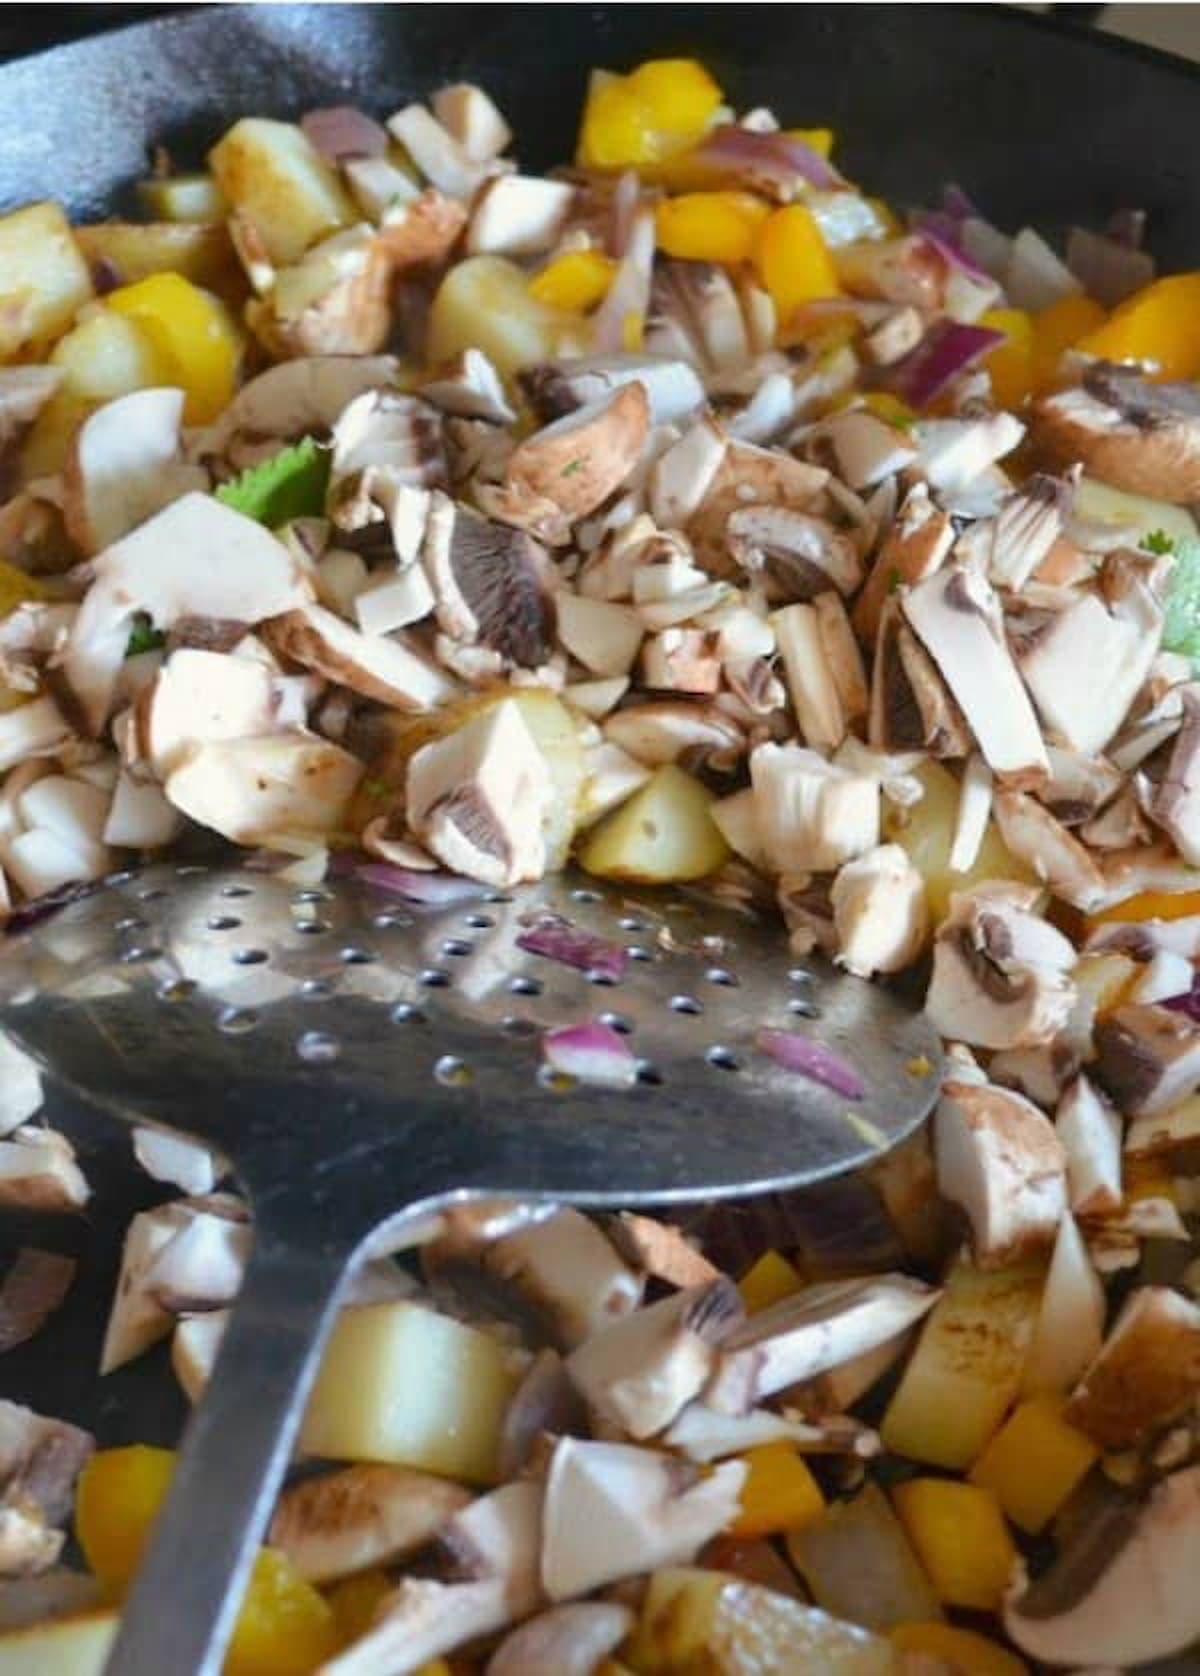 Add sliced mushrooms to breakfast potatoes for Breakfast Burrito Recipe.